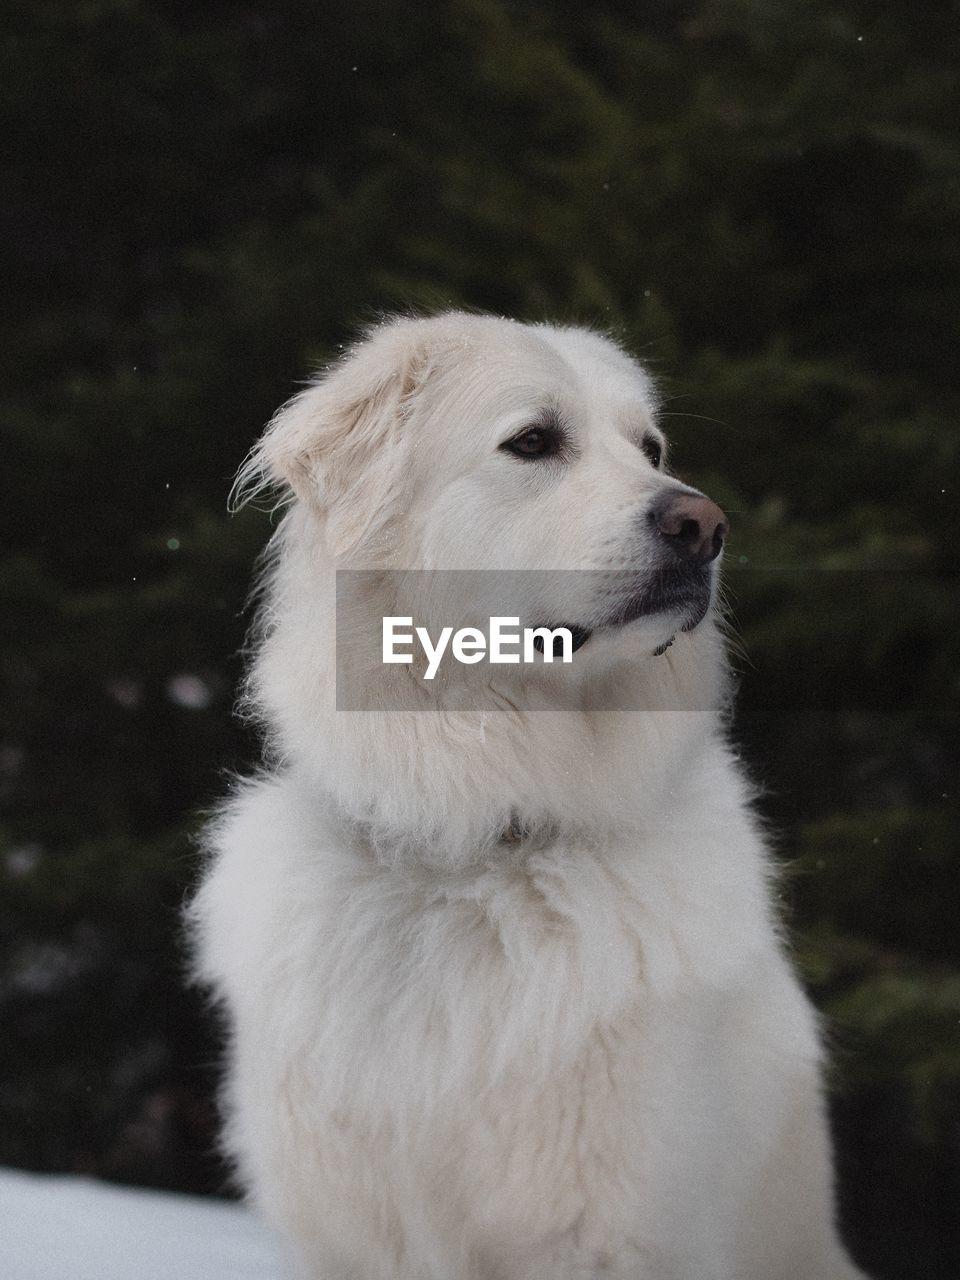 CLOSE-UP OF DOG SITTING ON FLOOR